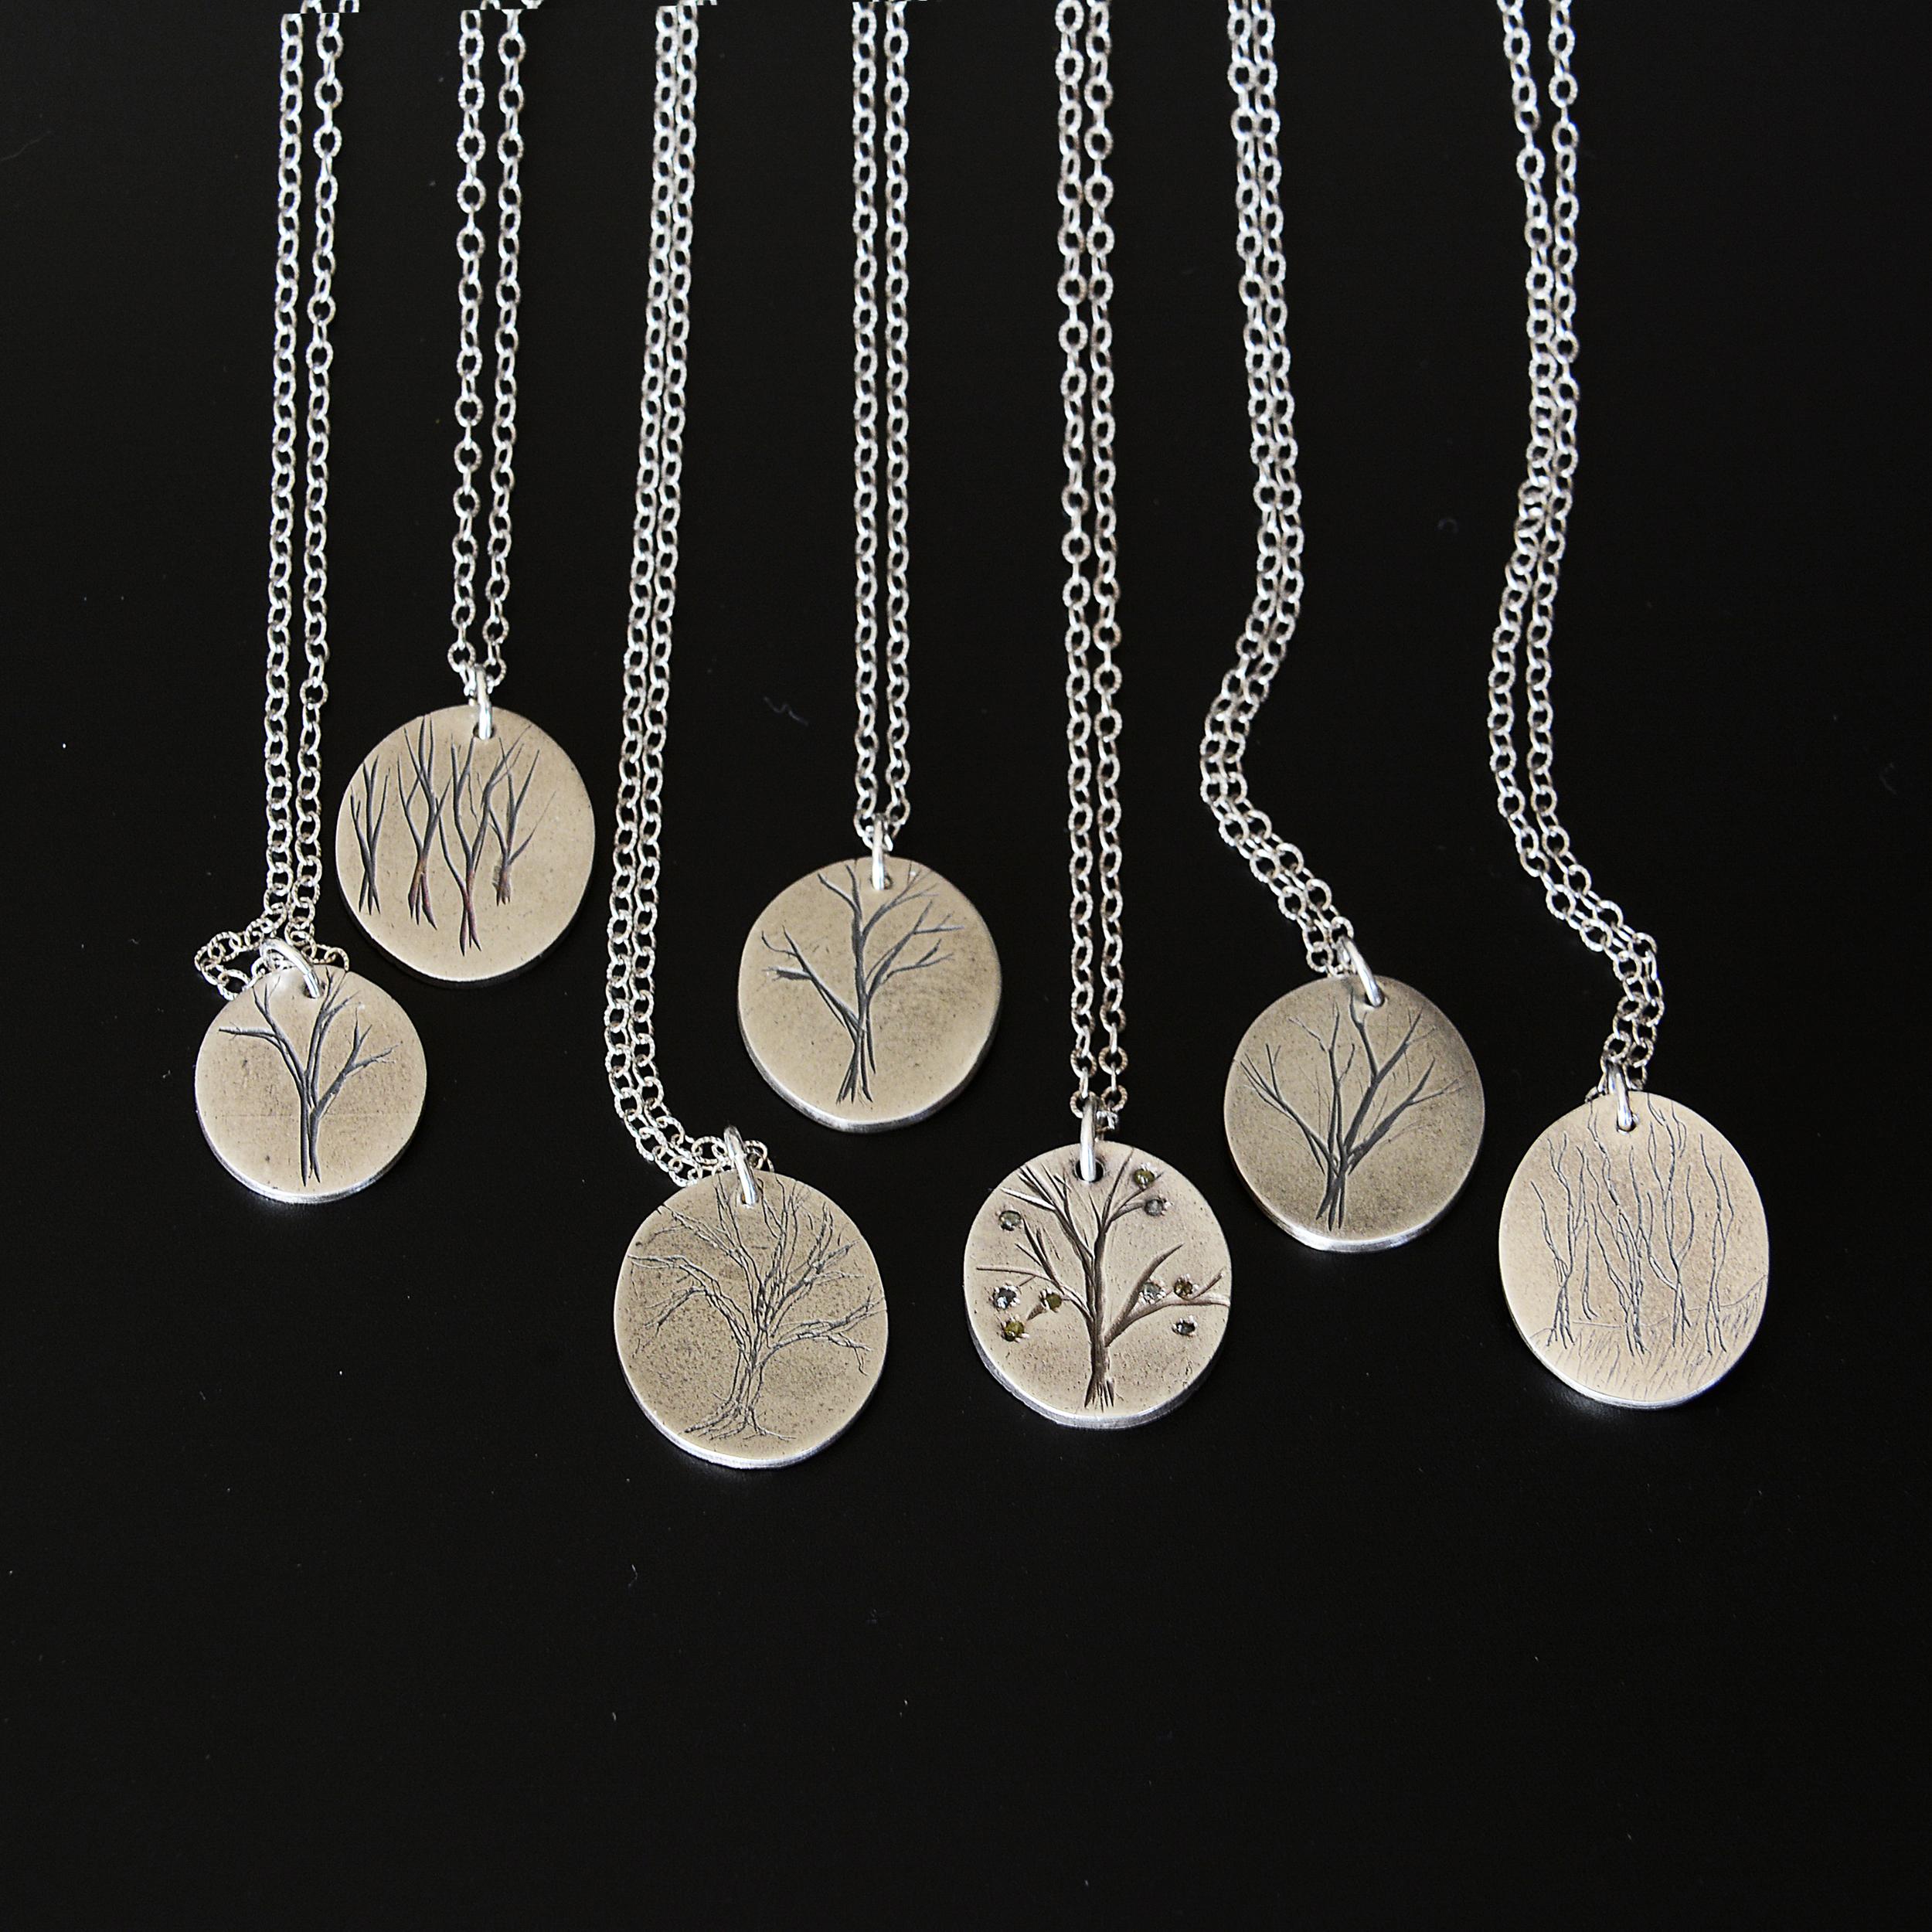 tree-pendants-michelle-hoting.jpg